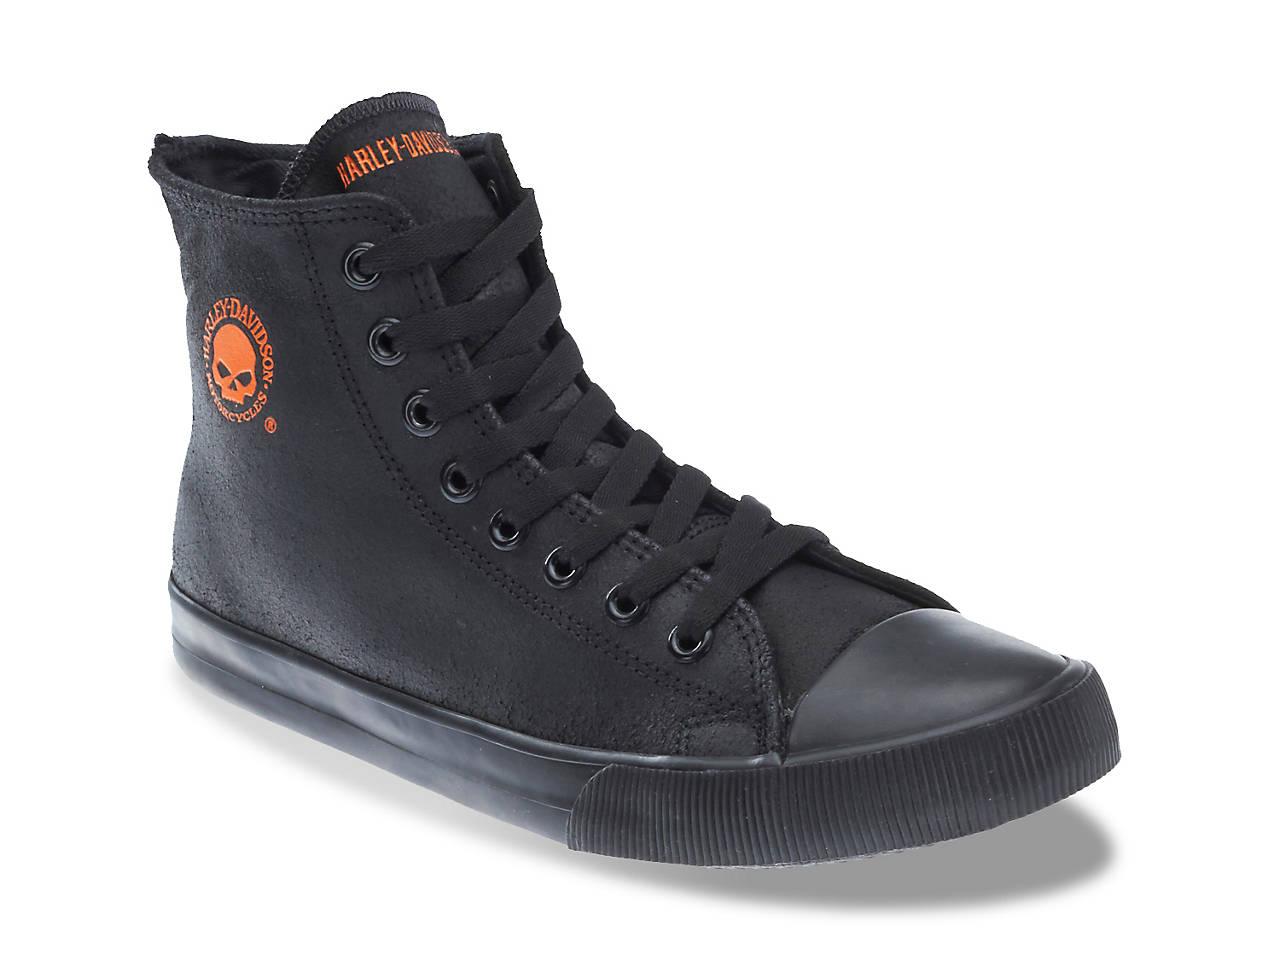 54ca0d2fe7b430 Harley-Davidson Baxter High-Top Sneaker Men s Shoes